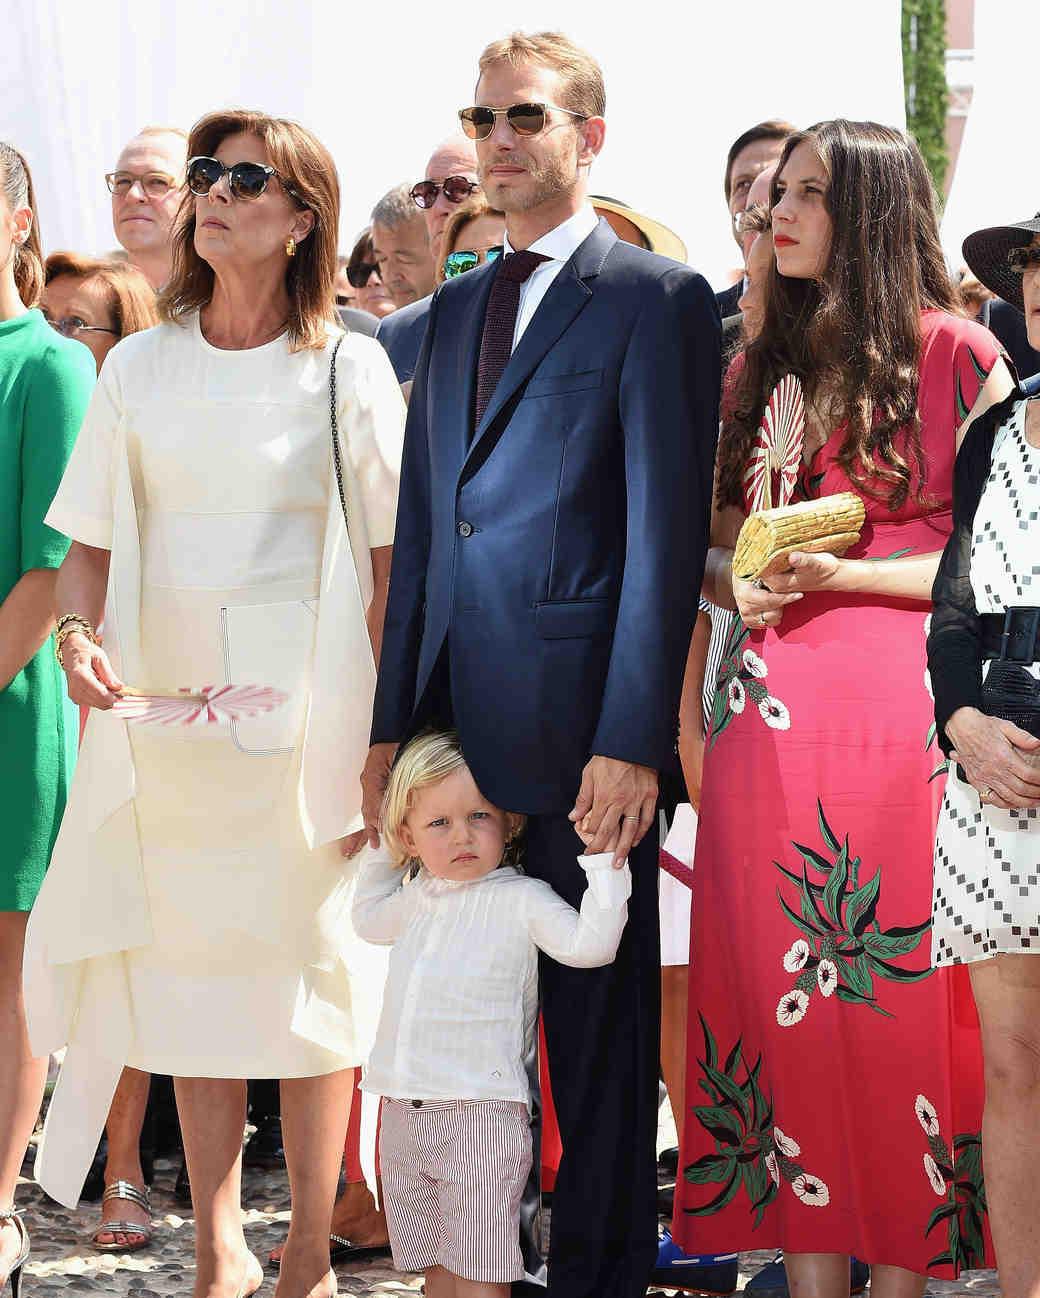 monaco-royal-wedding-pageboy-gettyimages-480403538-0715.jpg